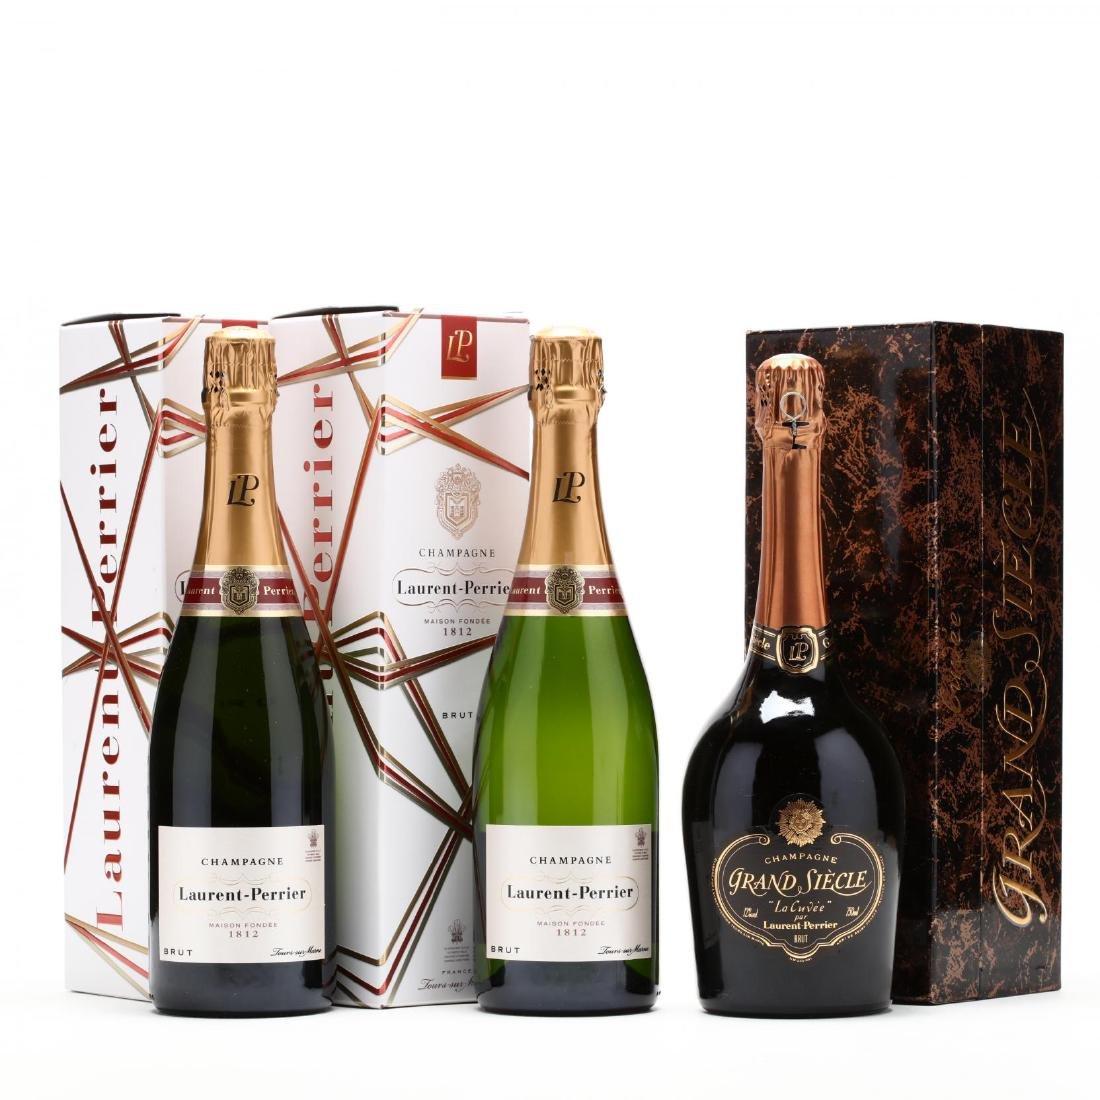 NV Laurent-Perrier Champagne